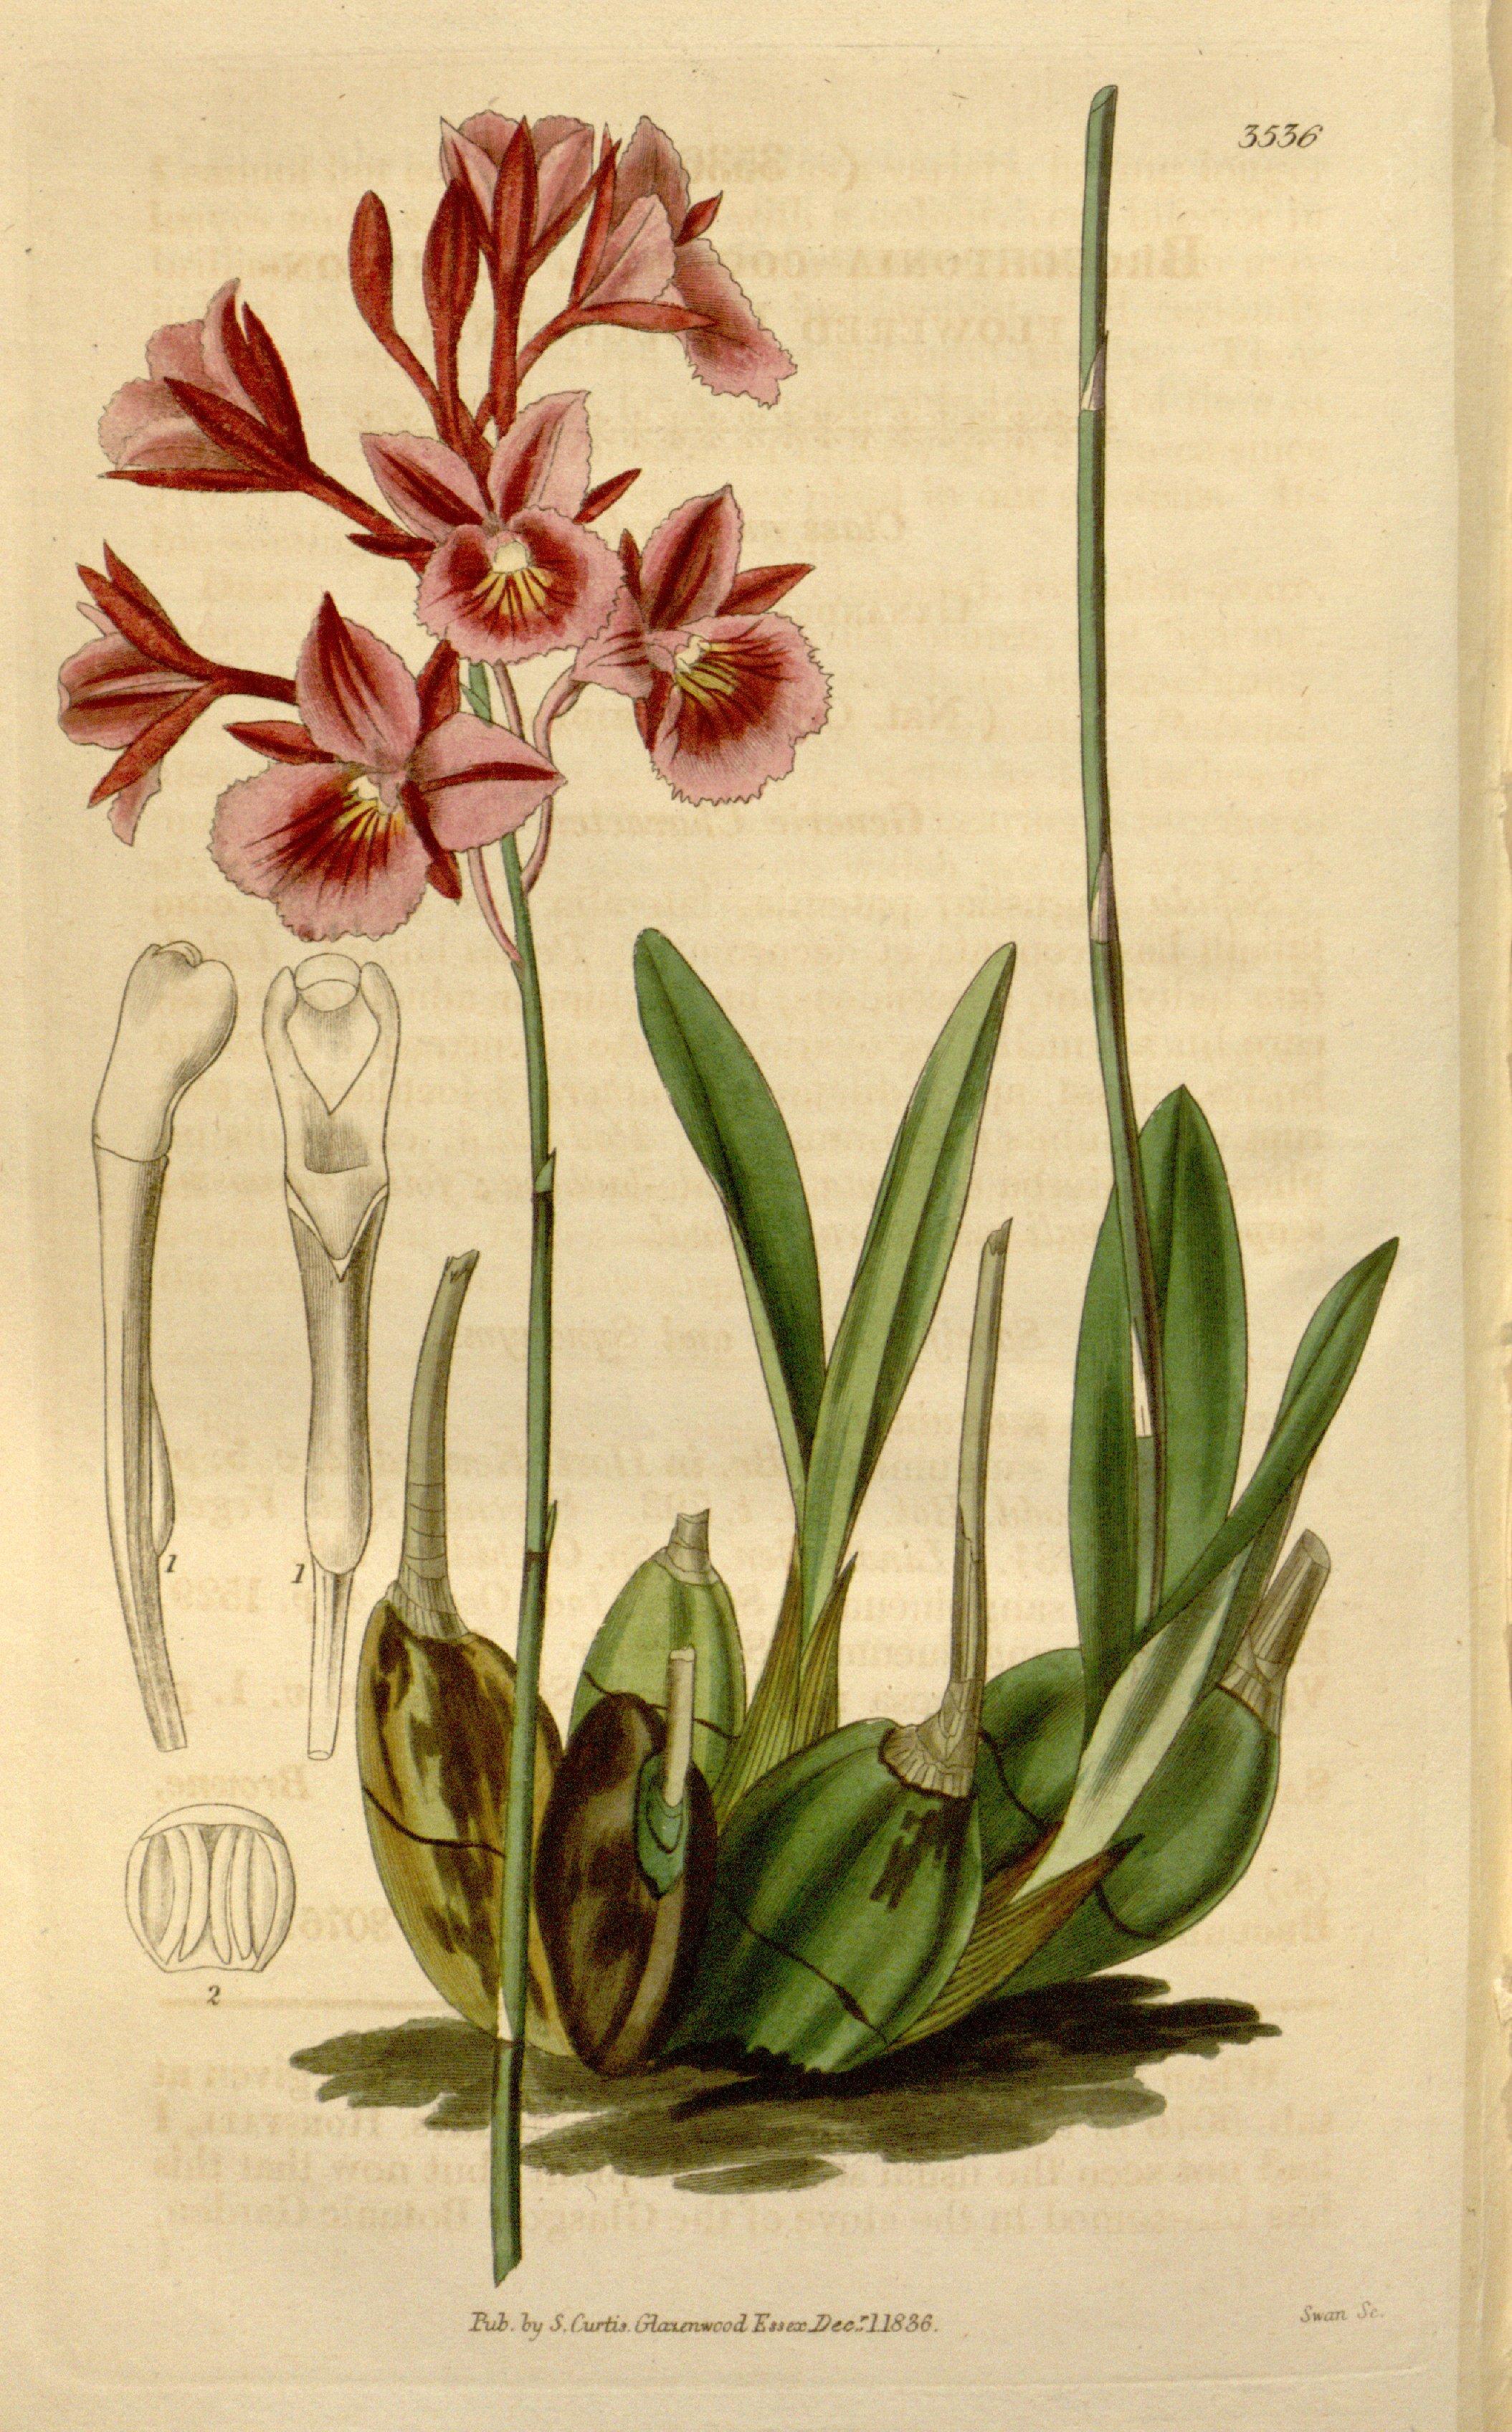 Image of Blood red Broughtonia